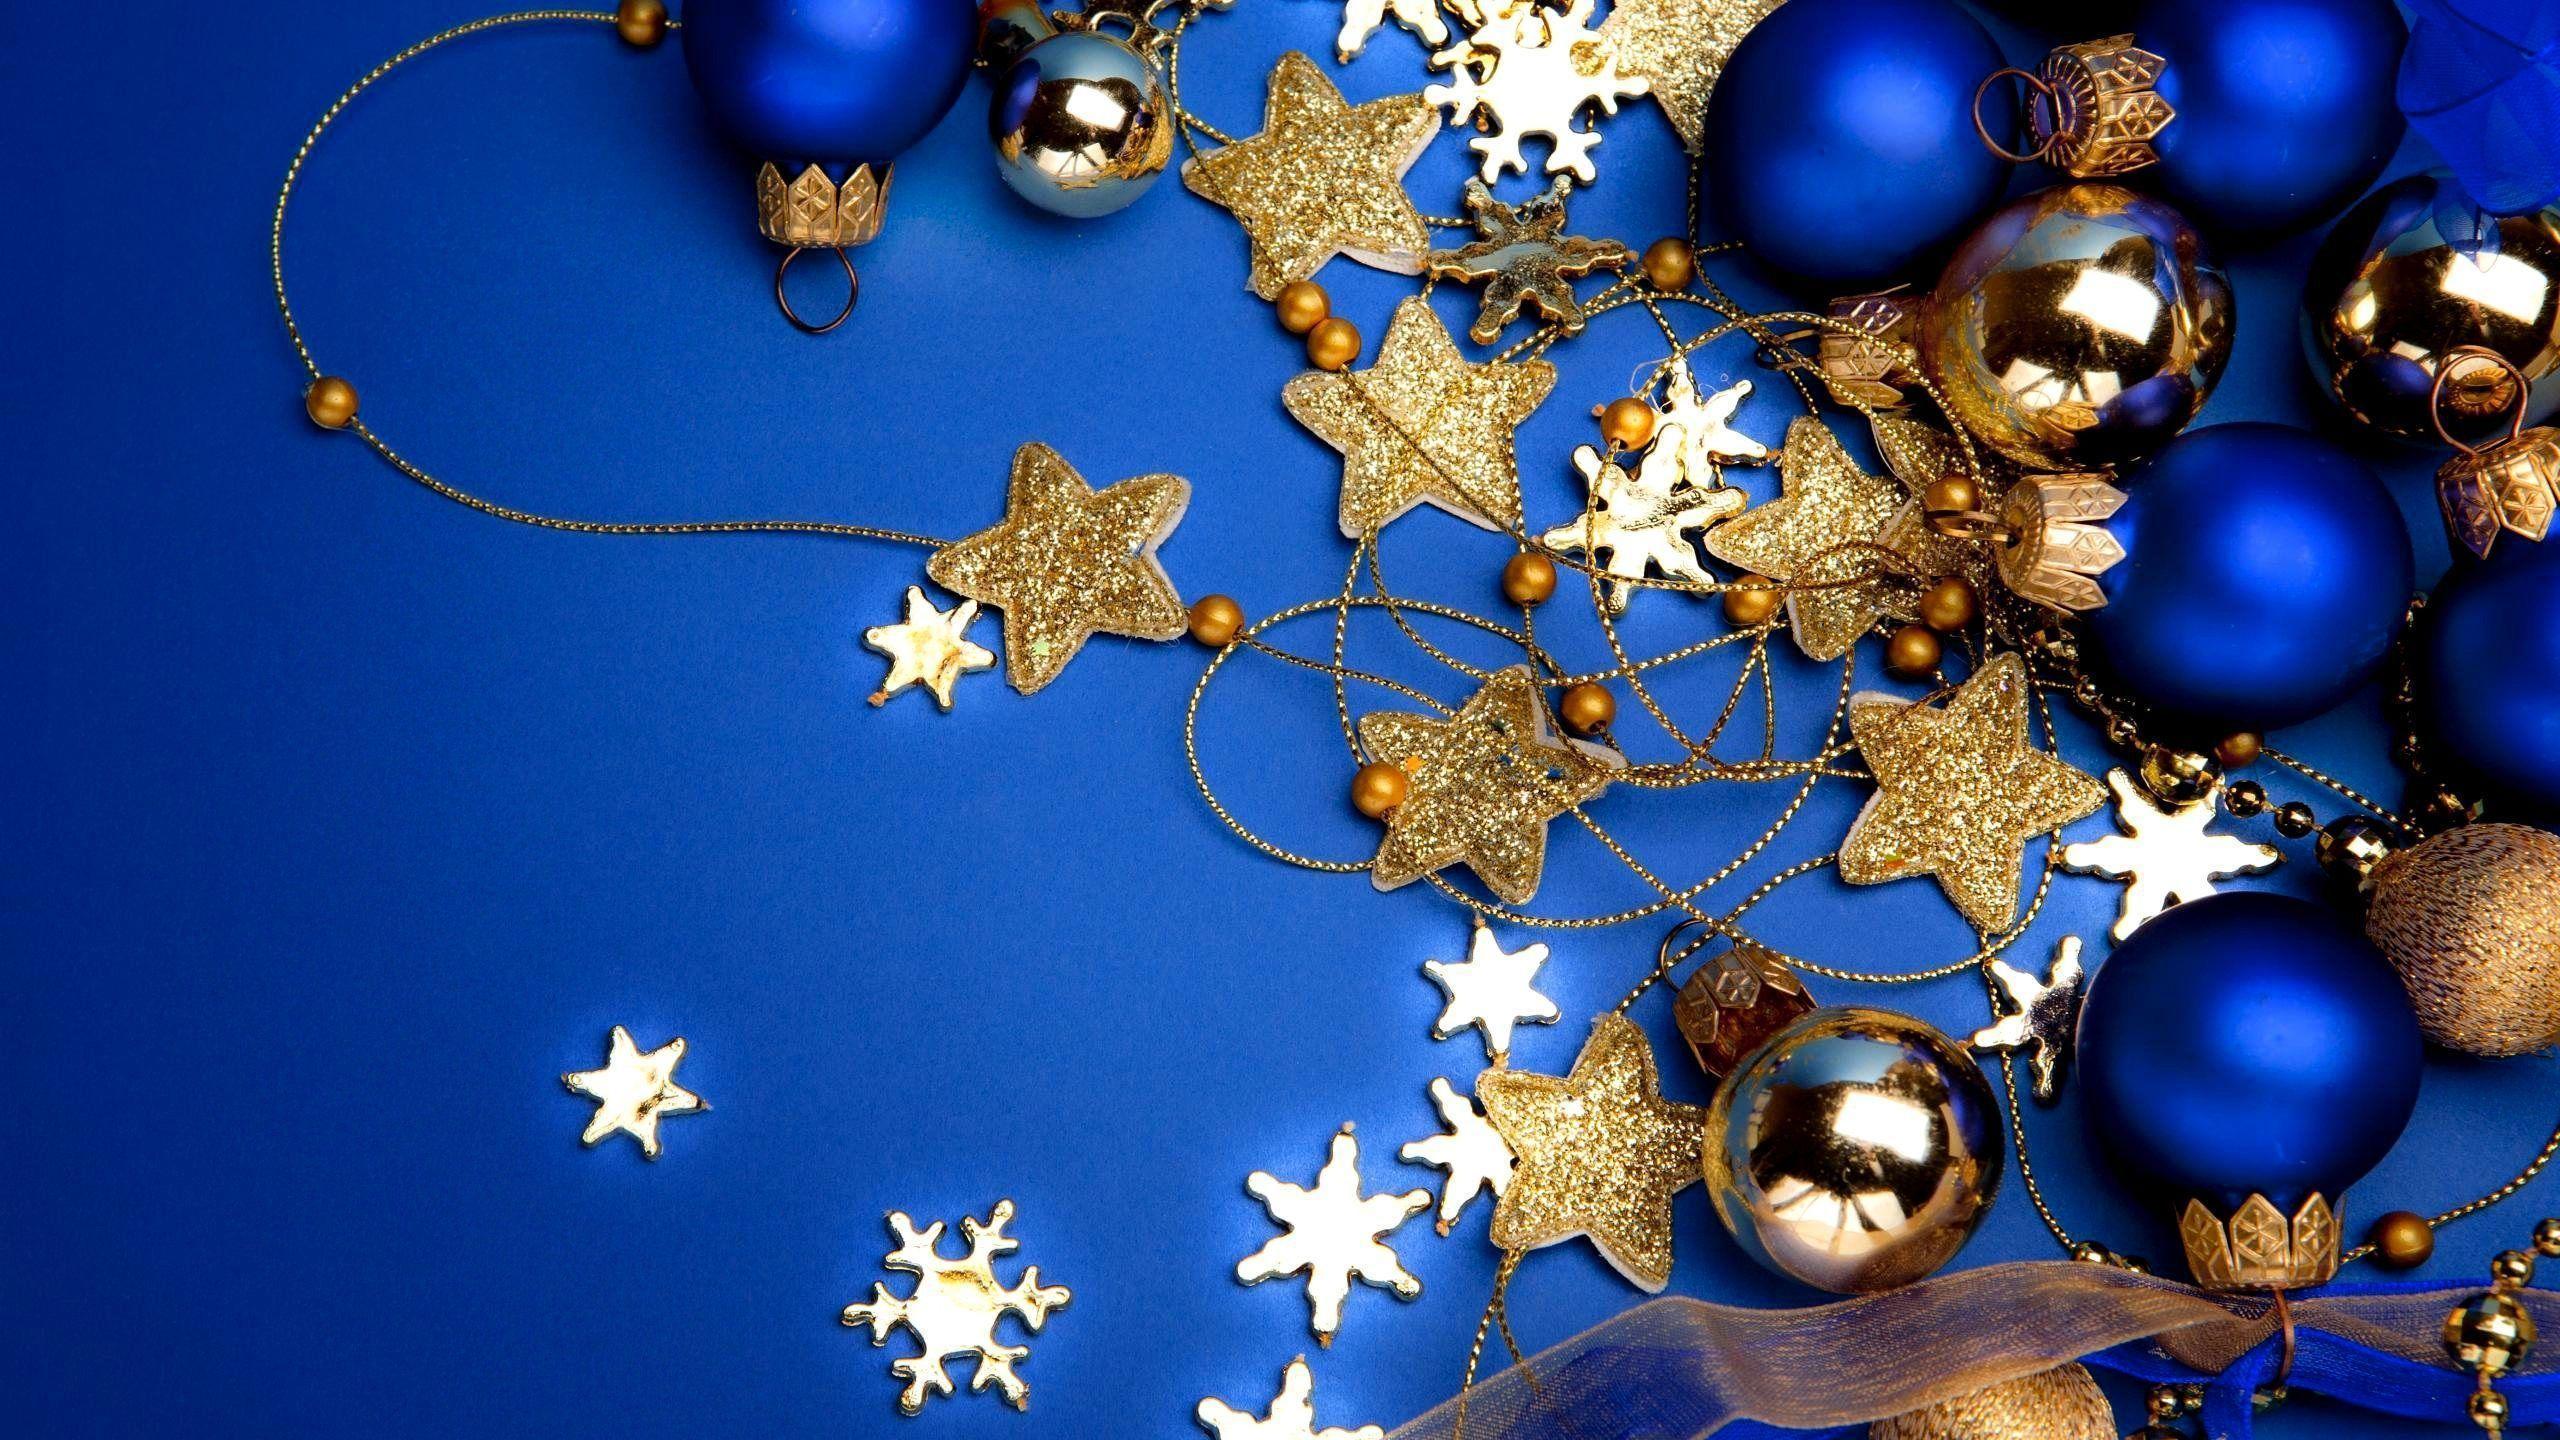 Christmas decorations Wallpaper | High Quality Wallpaper